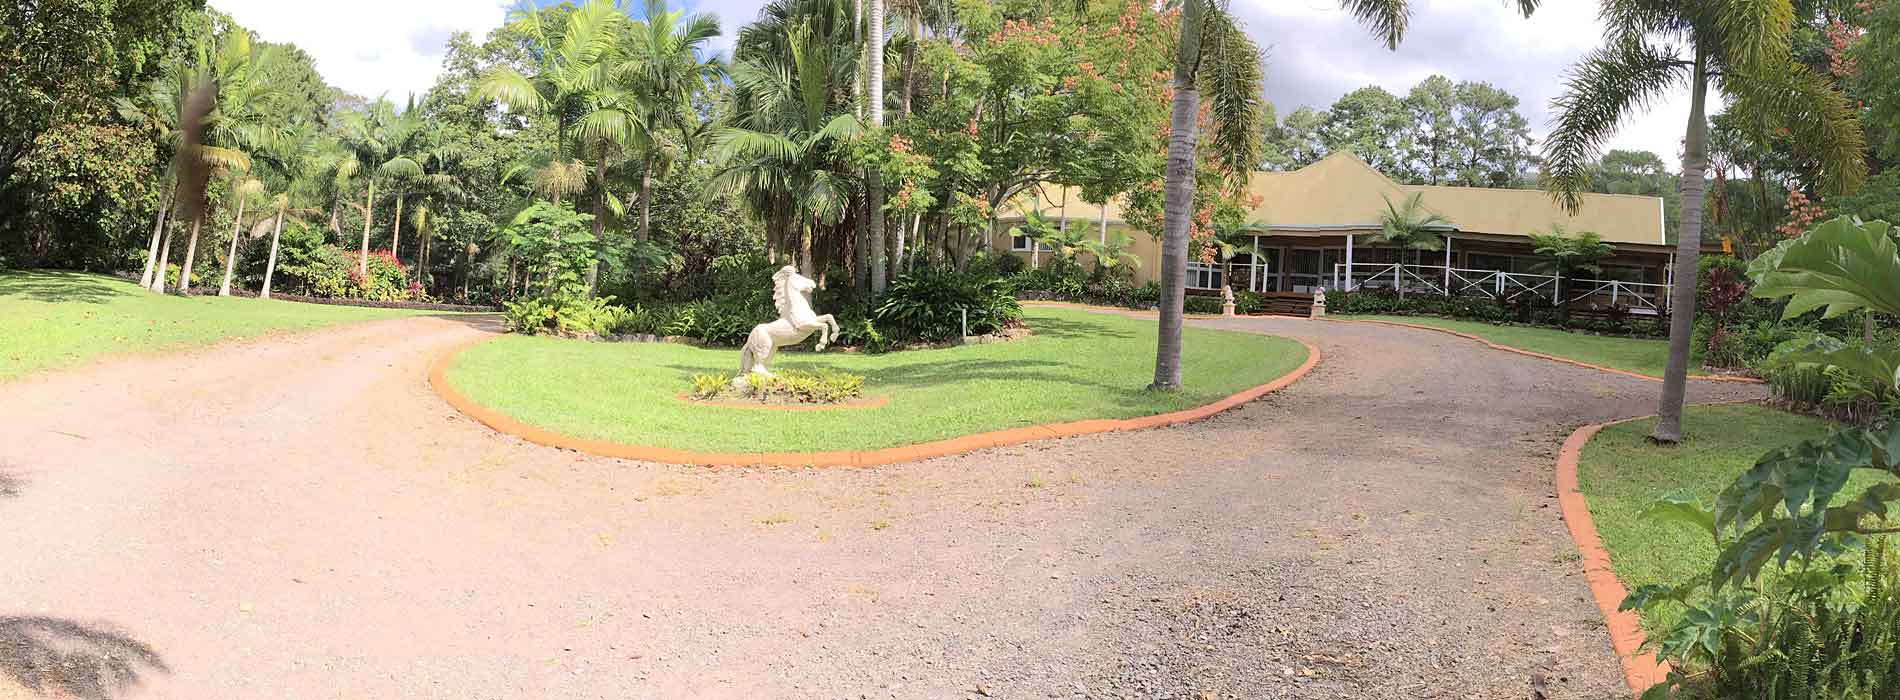 Merrypark Equestrian Centre, Eumundi, Sunshine Coast